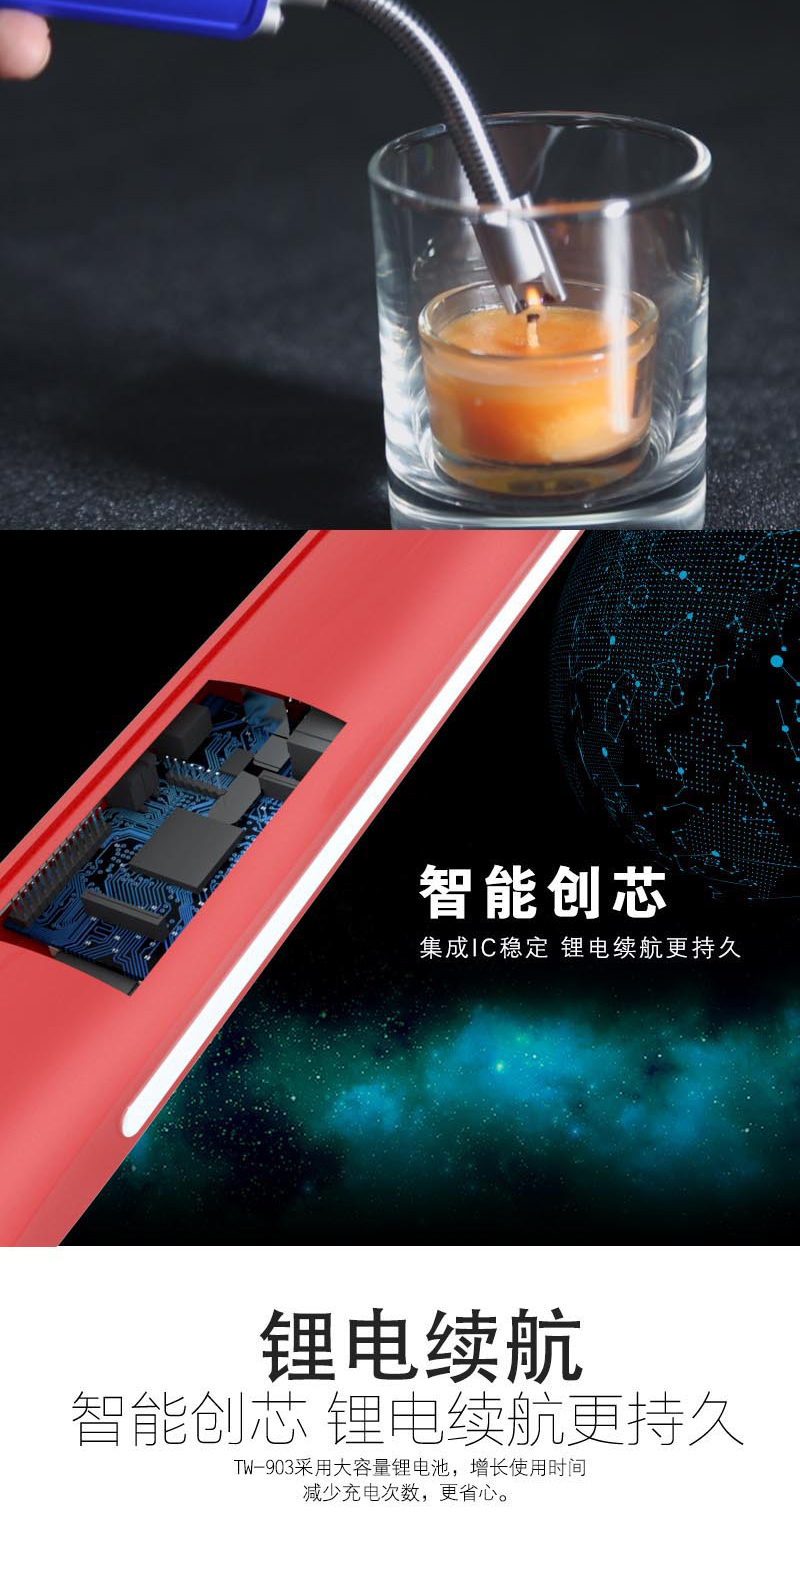 TW-903型电弧点火器介绍图_05